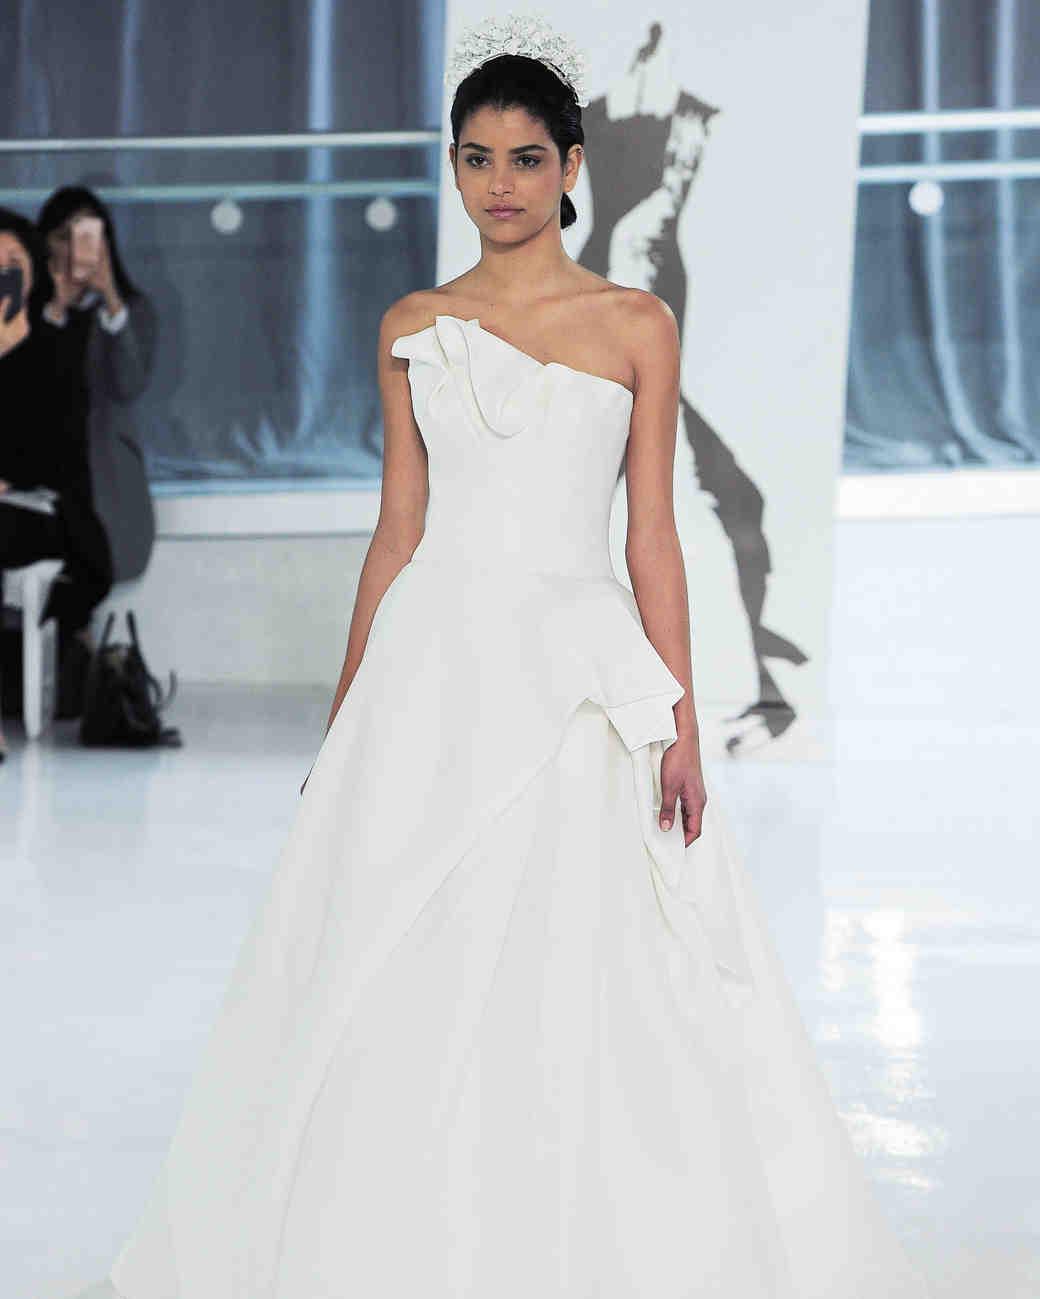 120615dc1 موديلات فساتين زفاف عصرية من تصميم بيتر لانغير لربيع 2018 - مشاهير